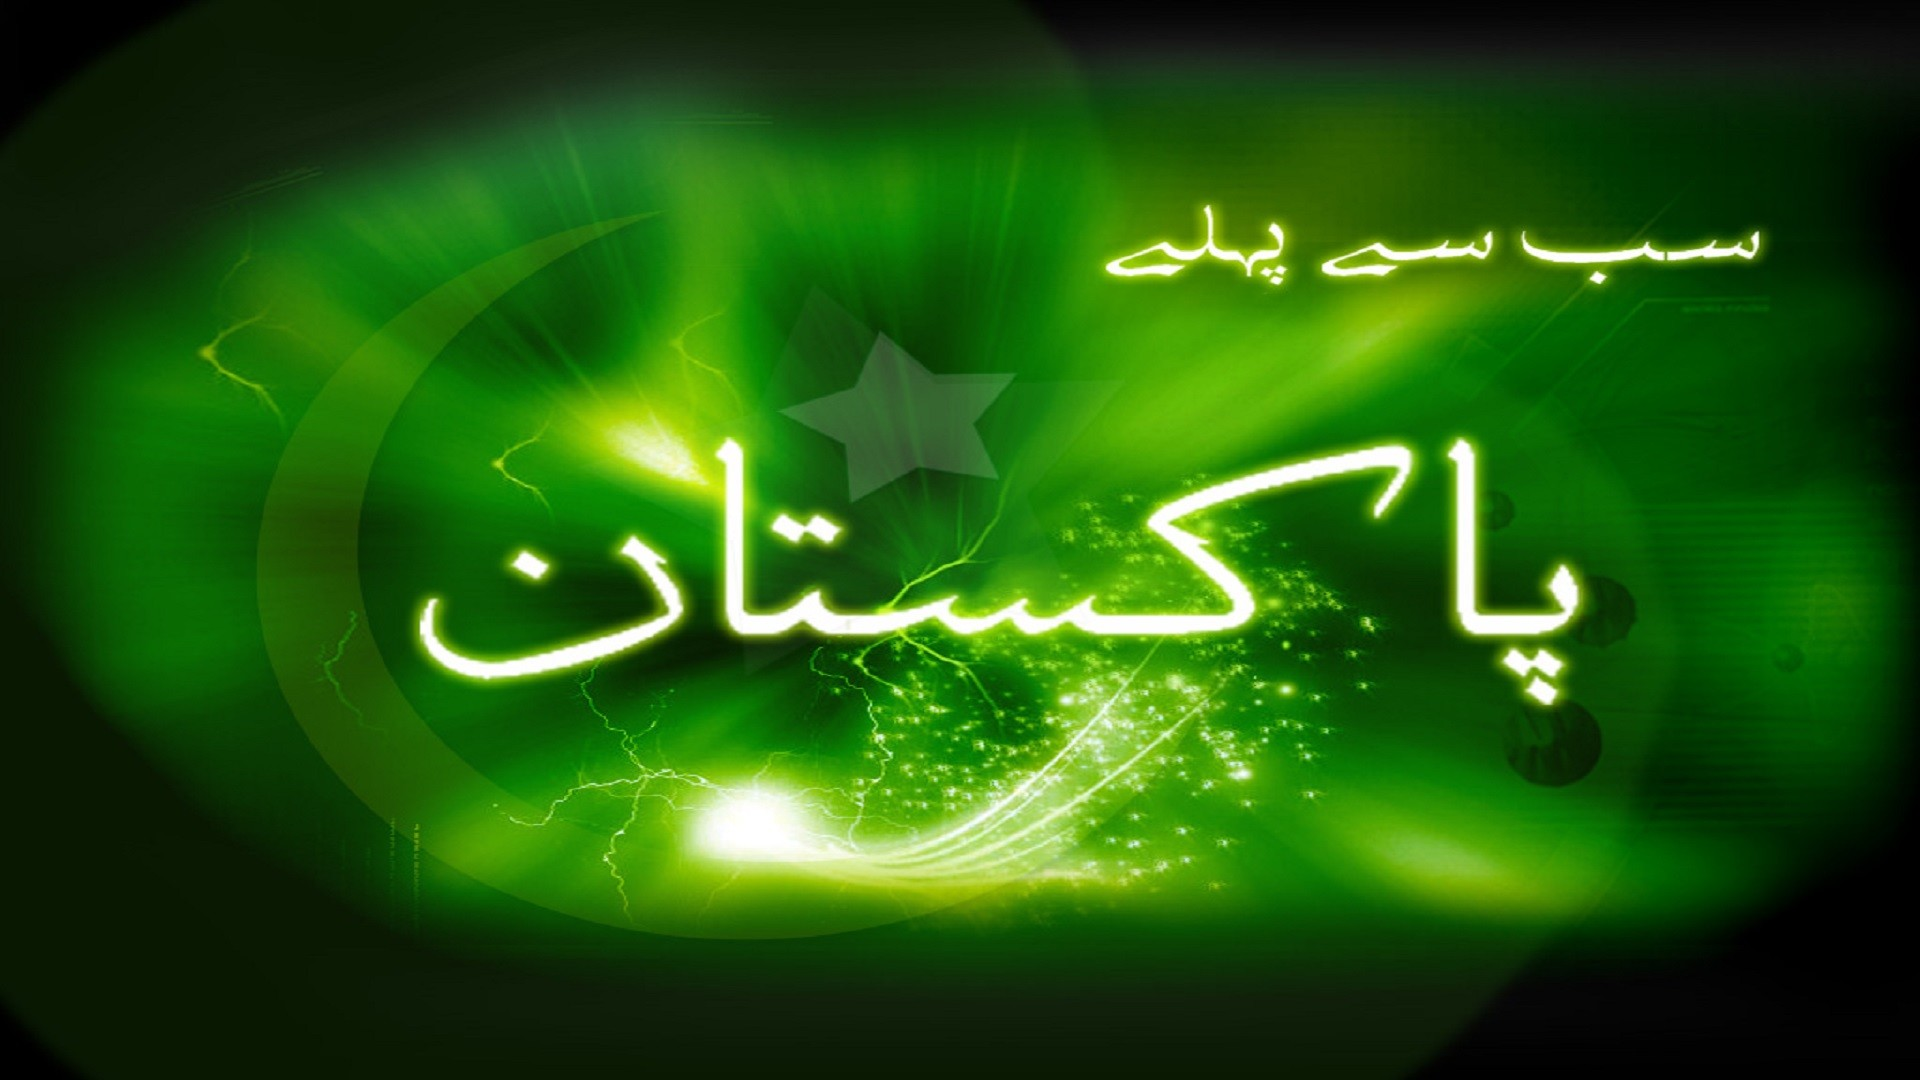 Res: 1920x1080, sab-sy-phle-pakistani-wallpapers-free-hd